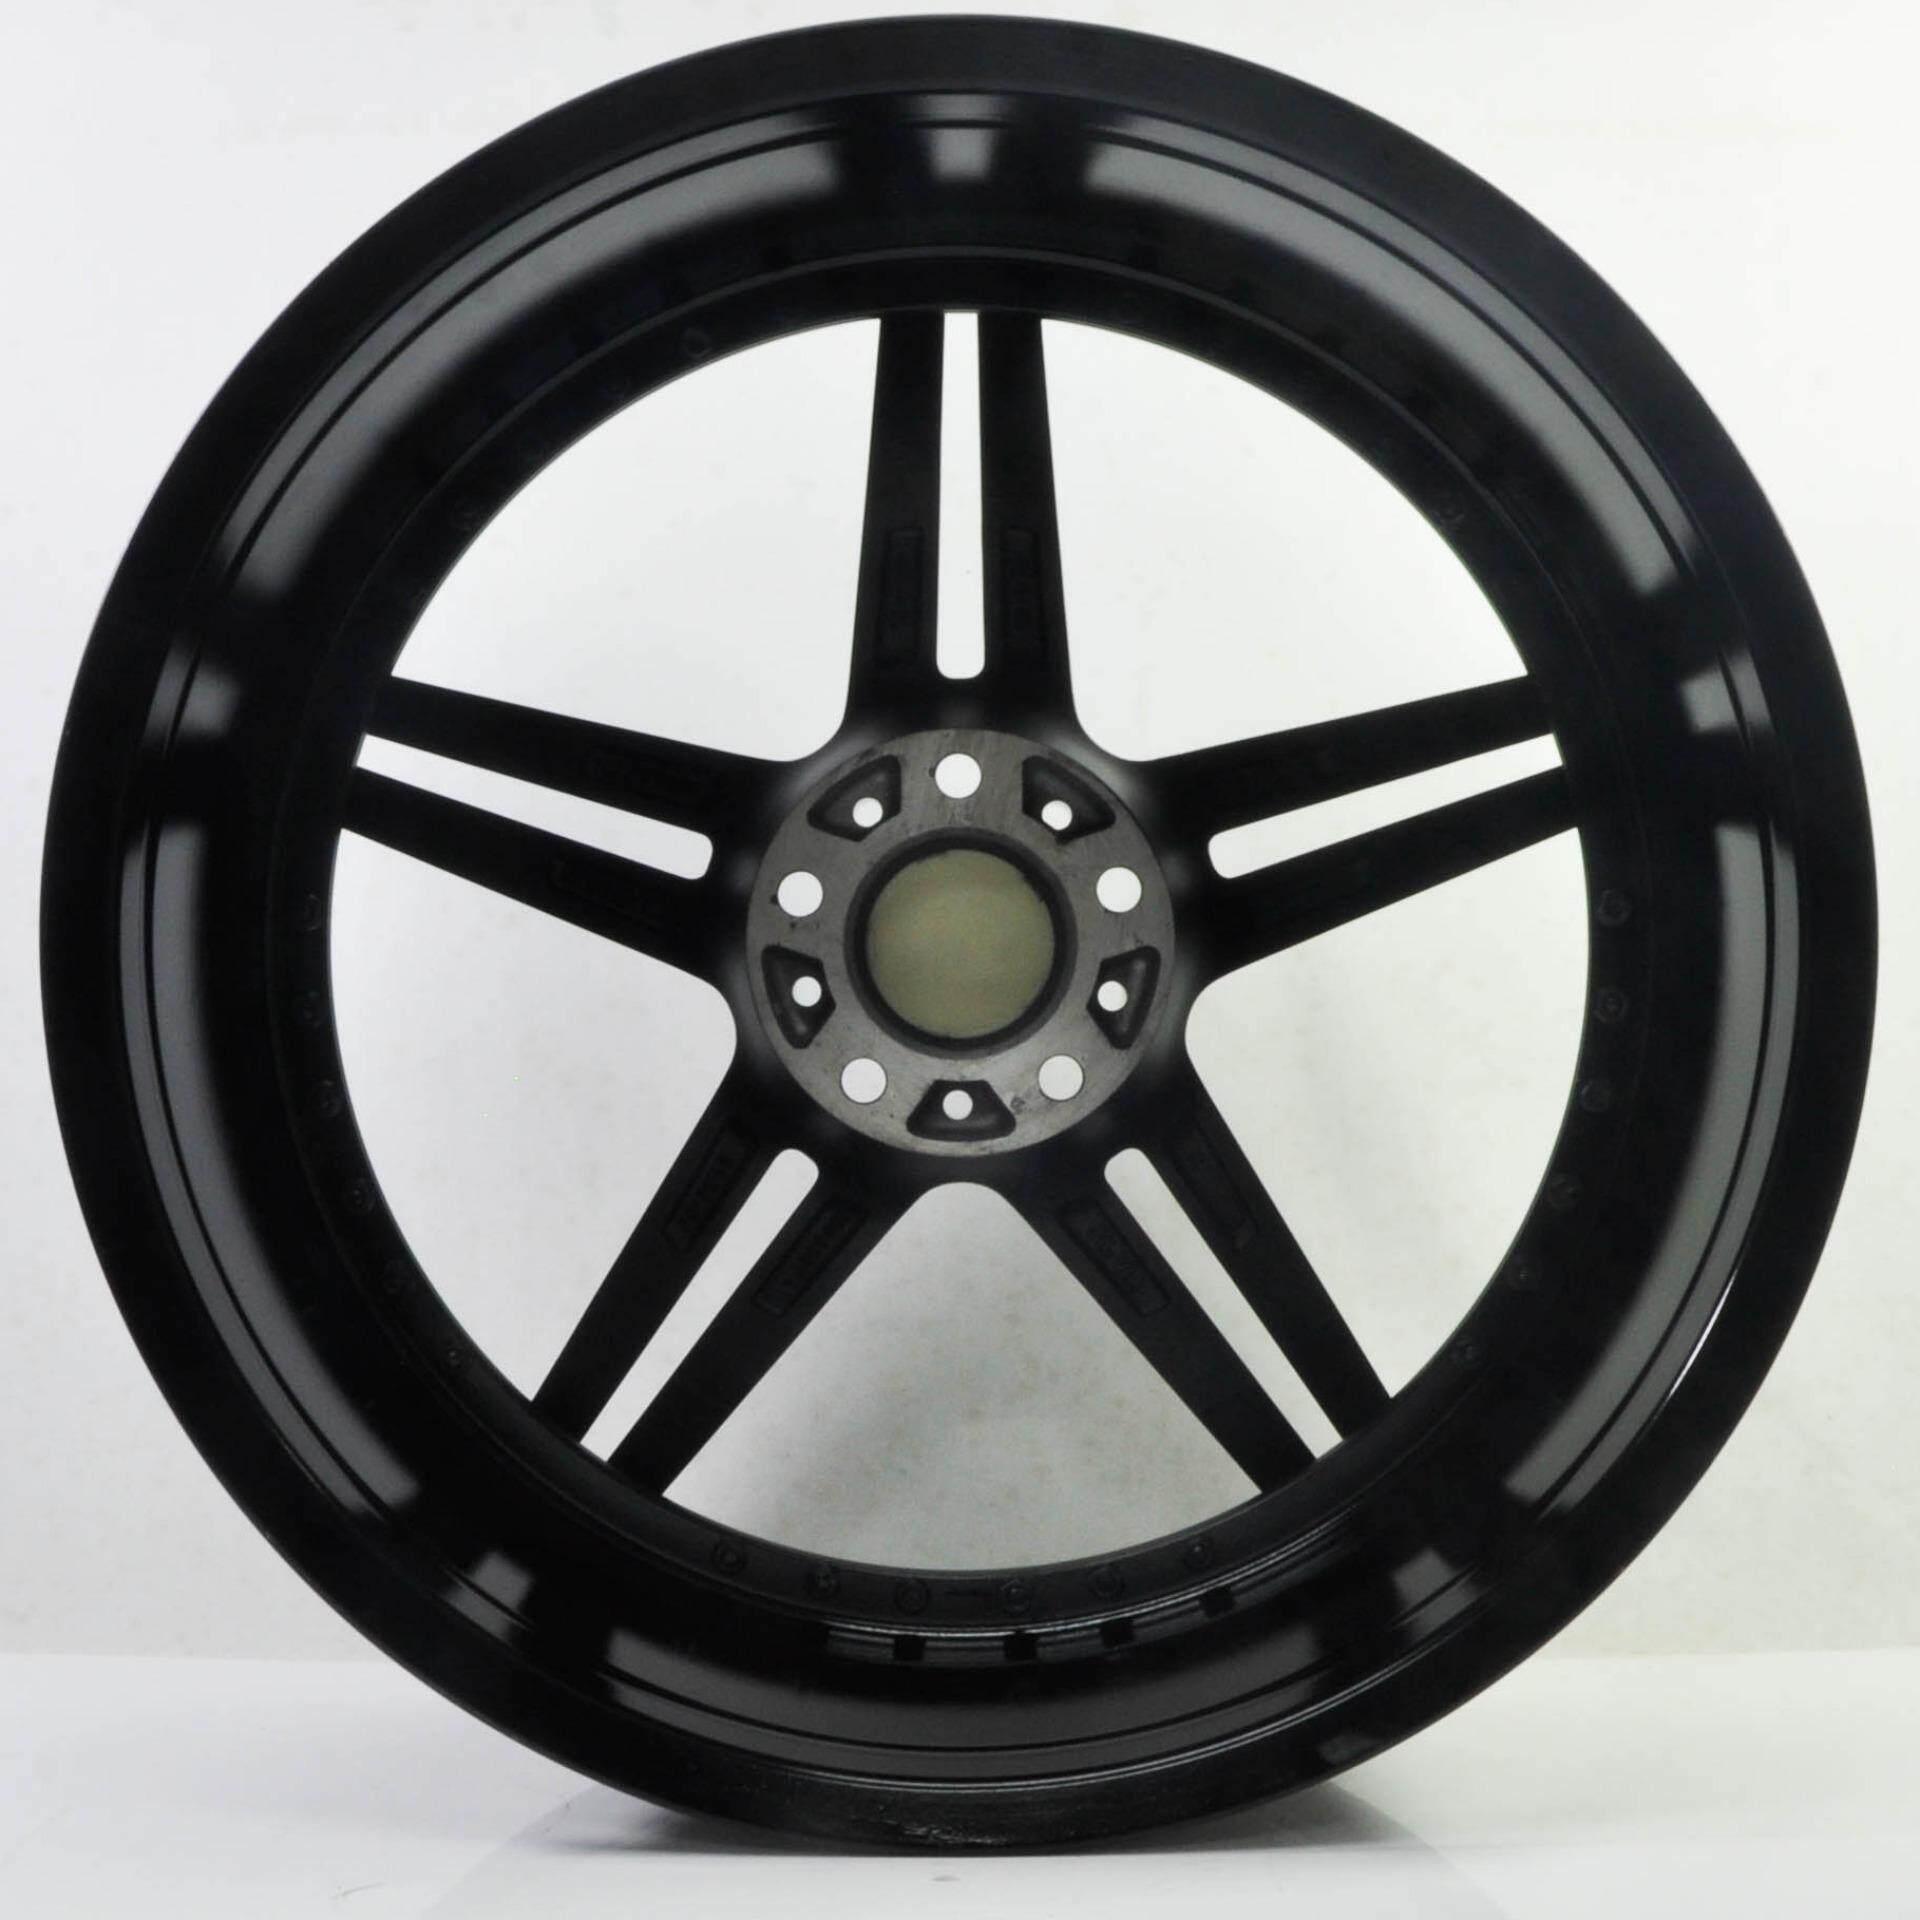 4pcs ADV1 20 inch 5X114.3 GREY LACQUER / BLACK RIVET